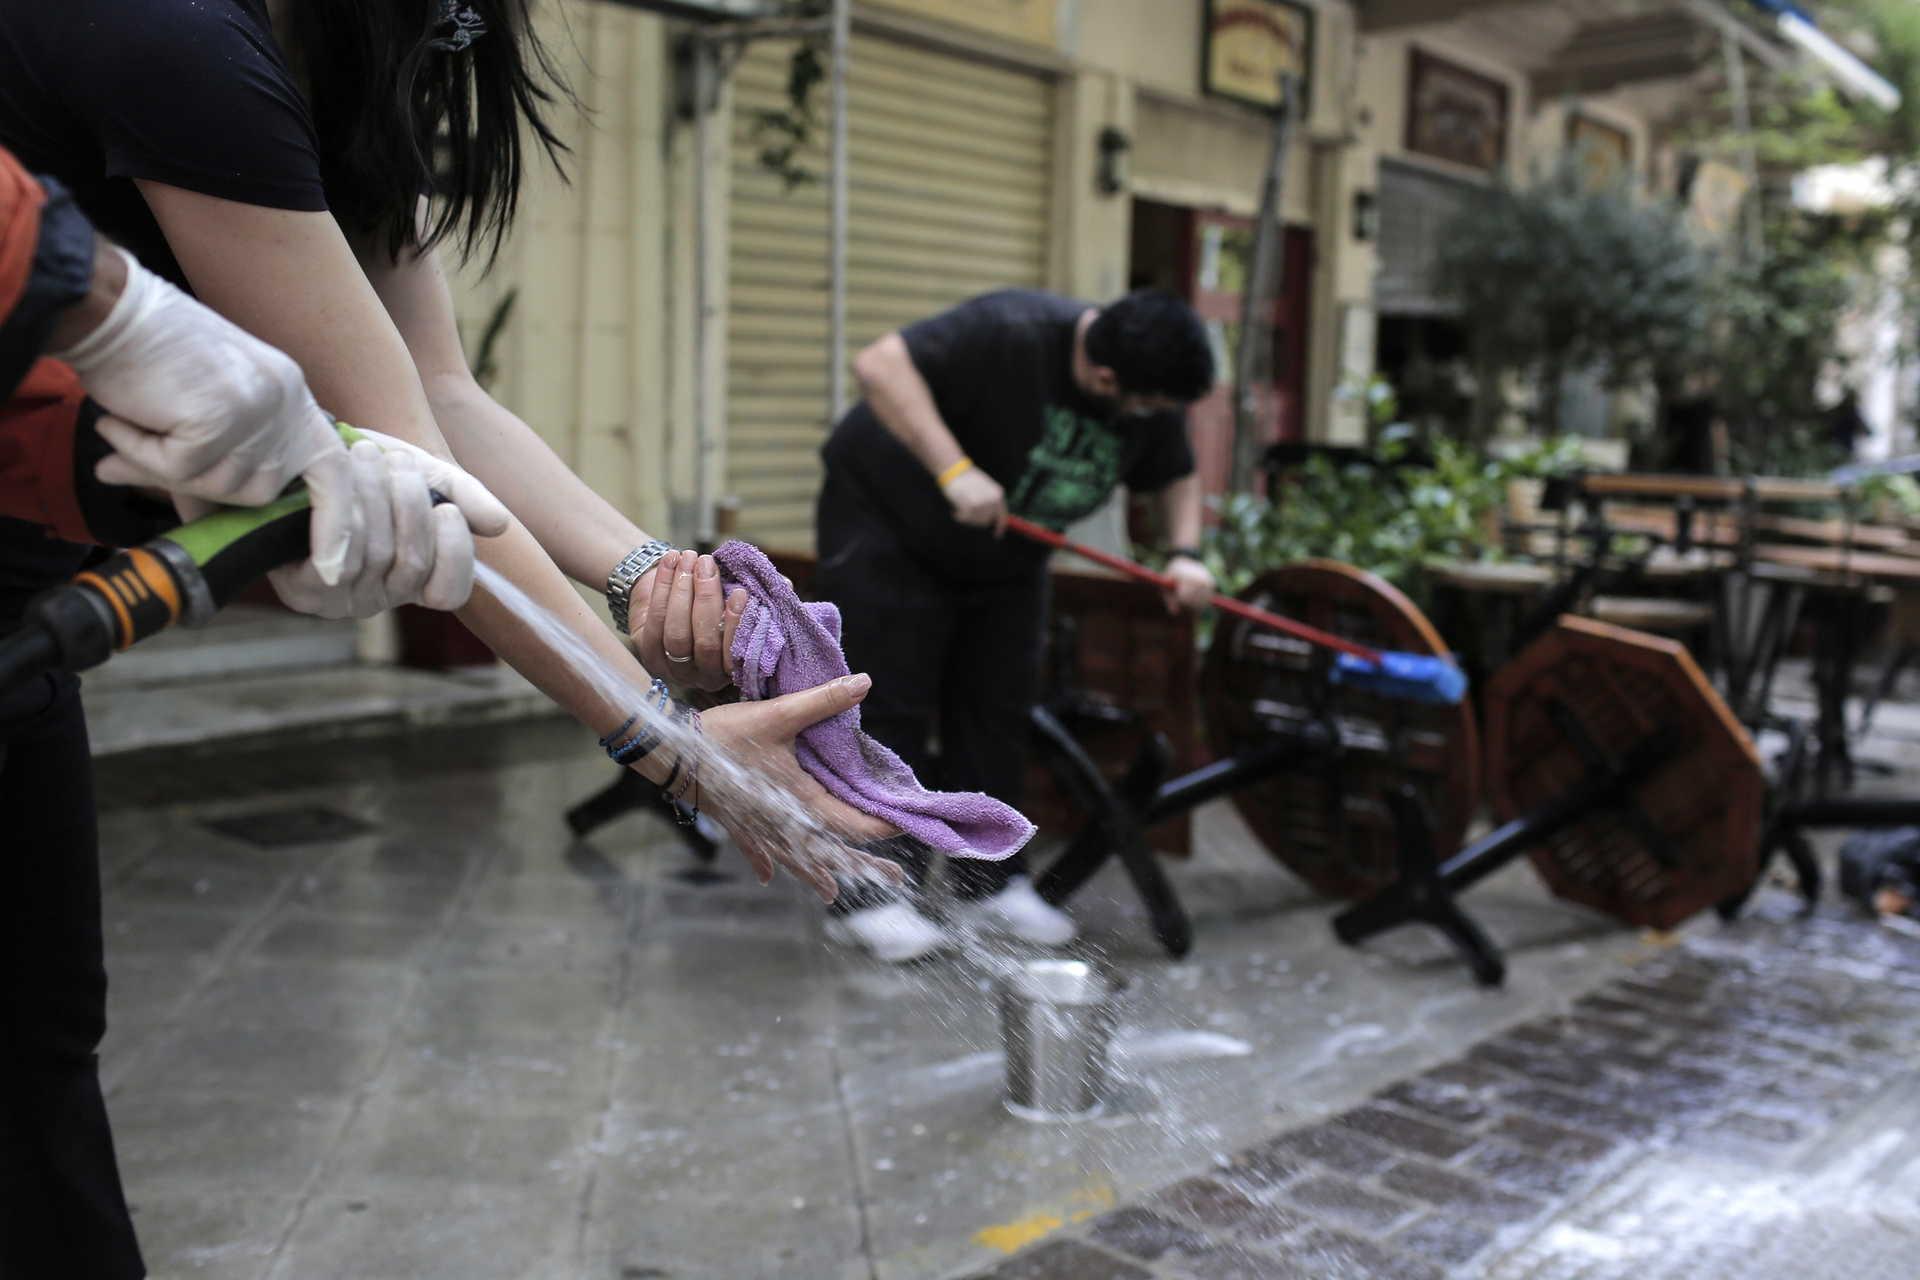 Restaurante gregos reabrem esta segunda-feira